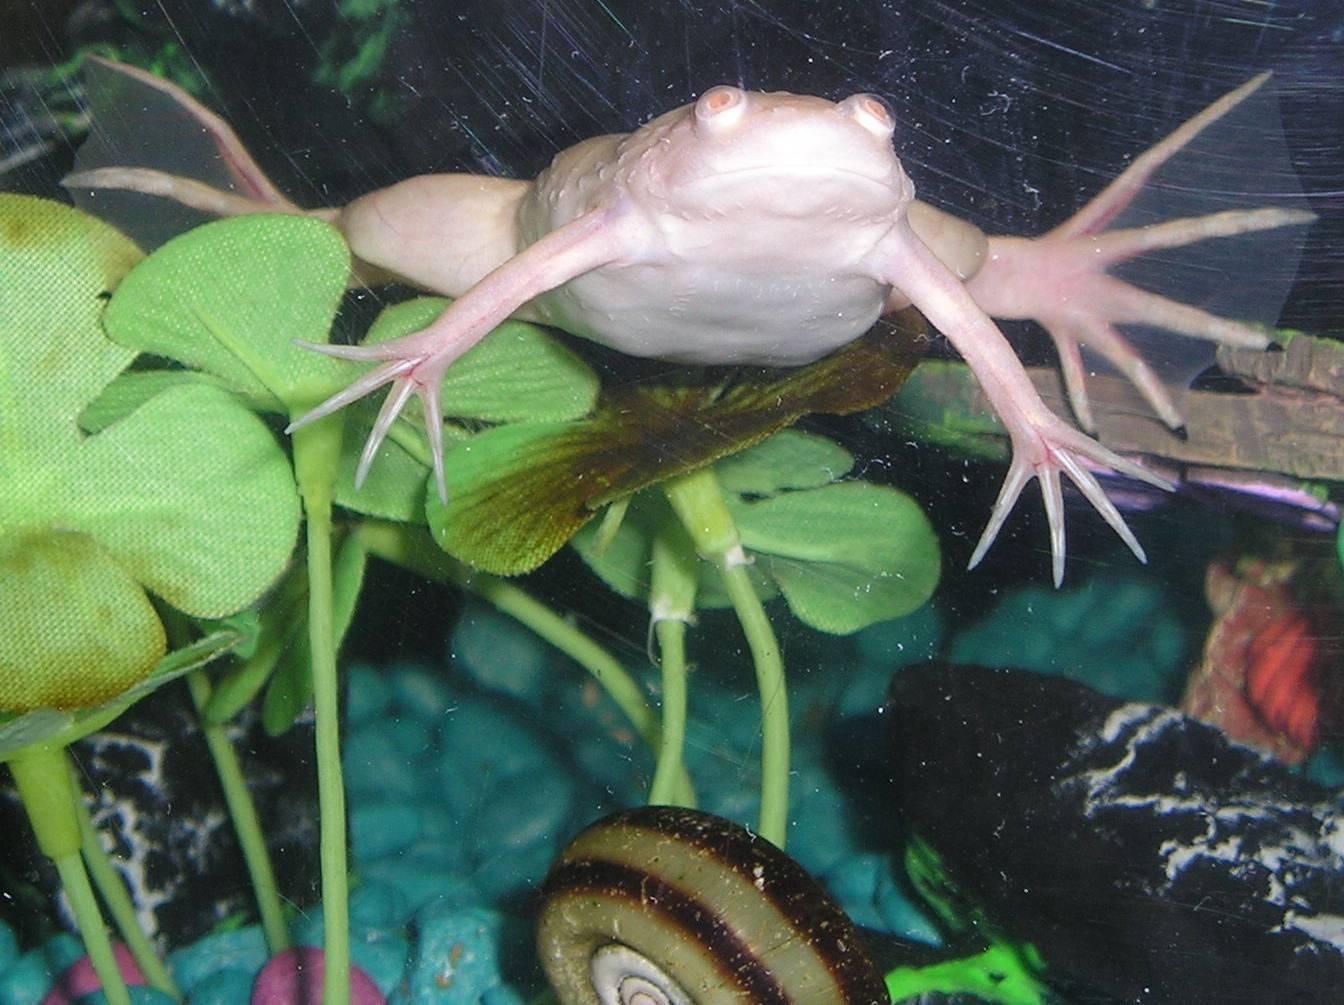 Лягушка гименохирус в аквариуме - описание,размножение,содержание,фото,видео | аквариумные рыбки